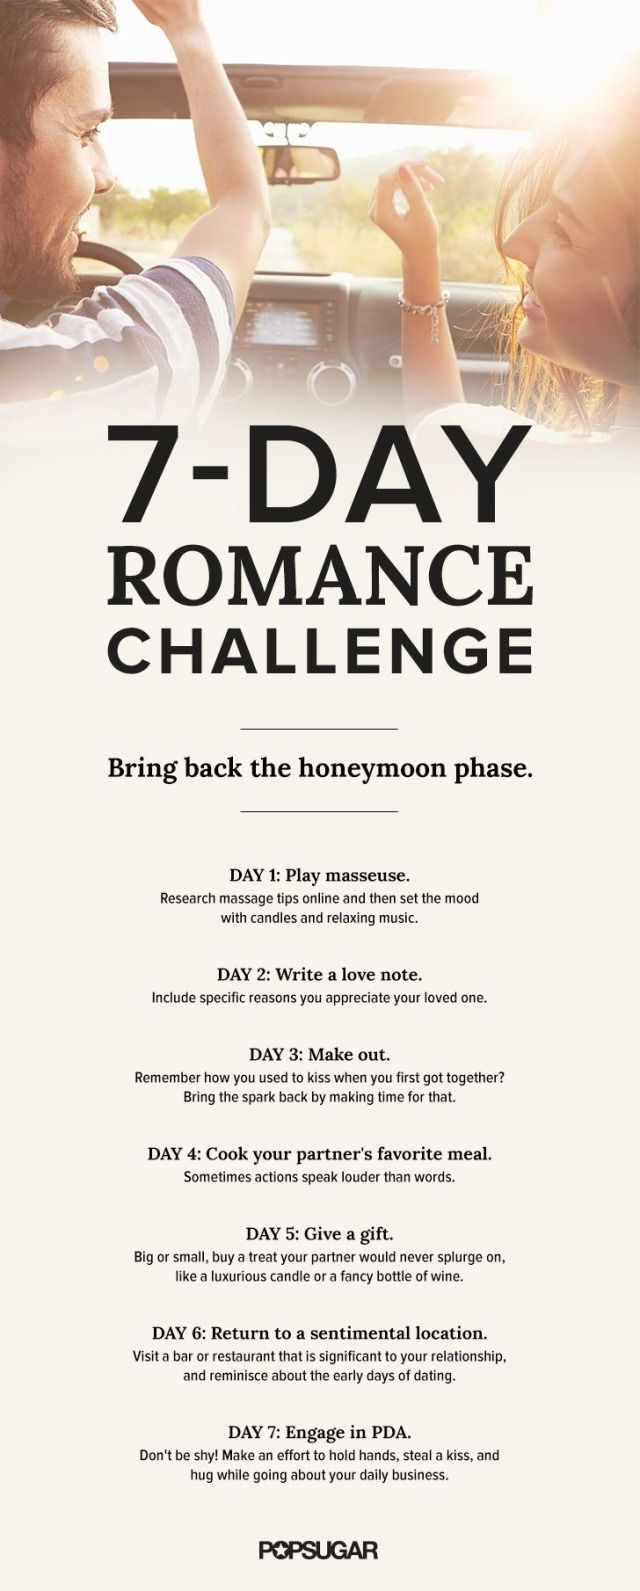 Dating honeymoon phase over